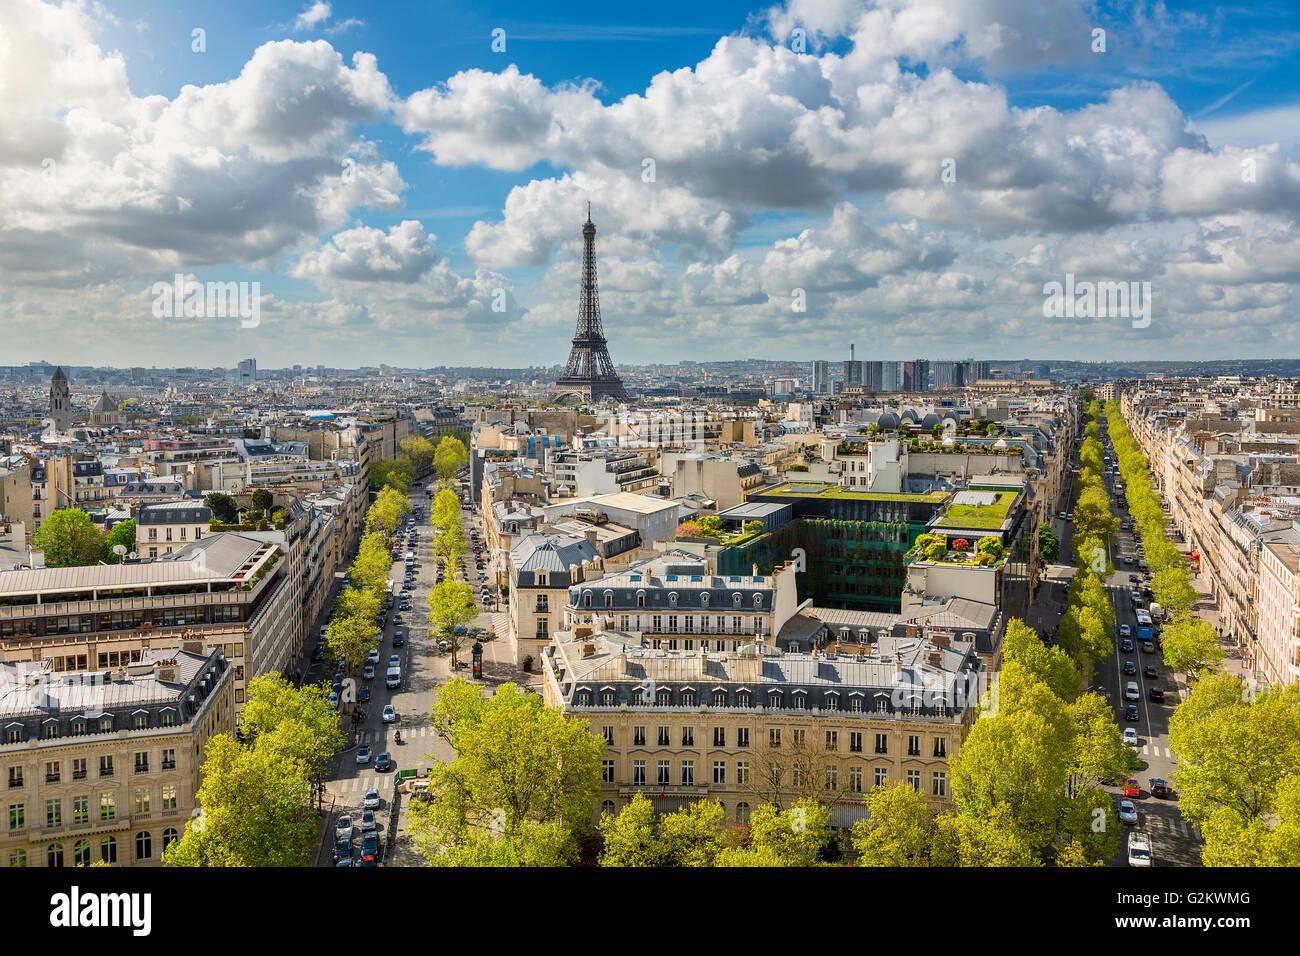 Skyline of Paris with Eiffel Tower - Stock Image